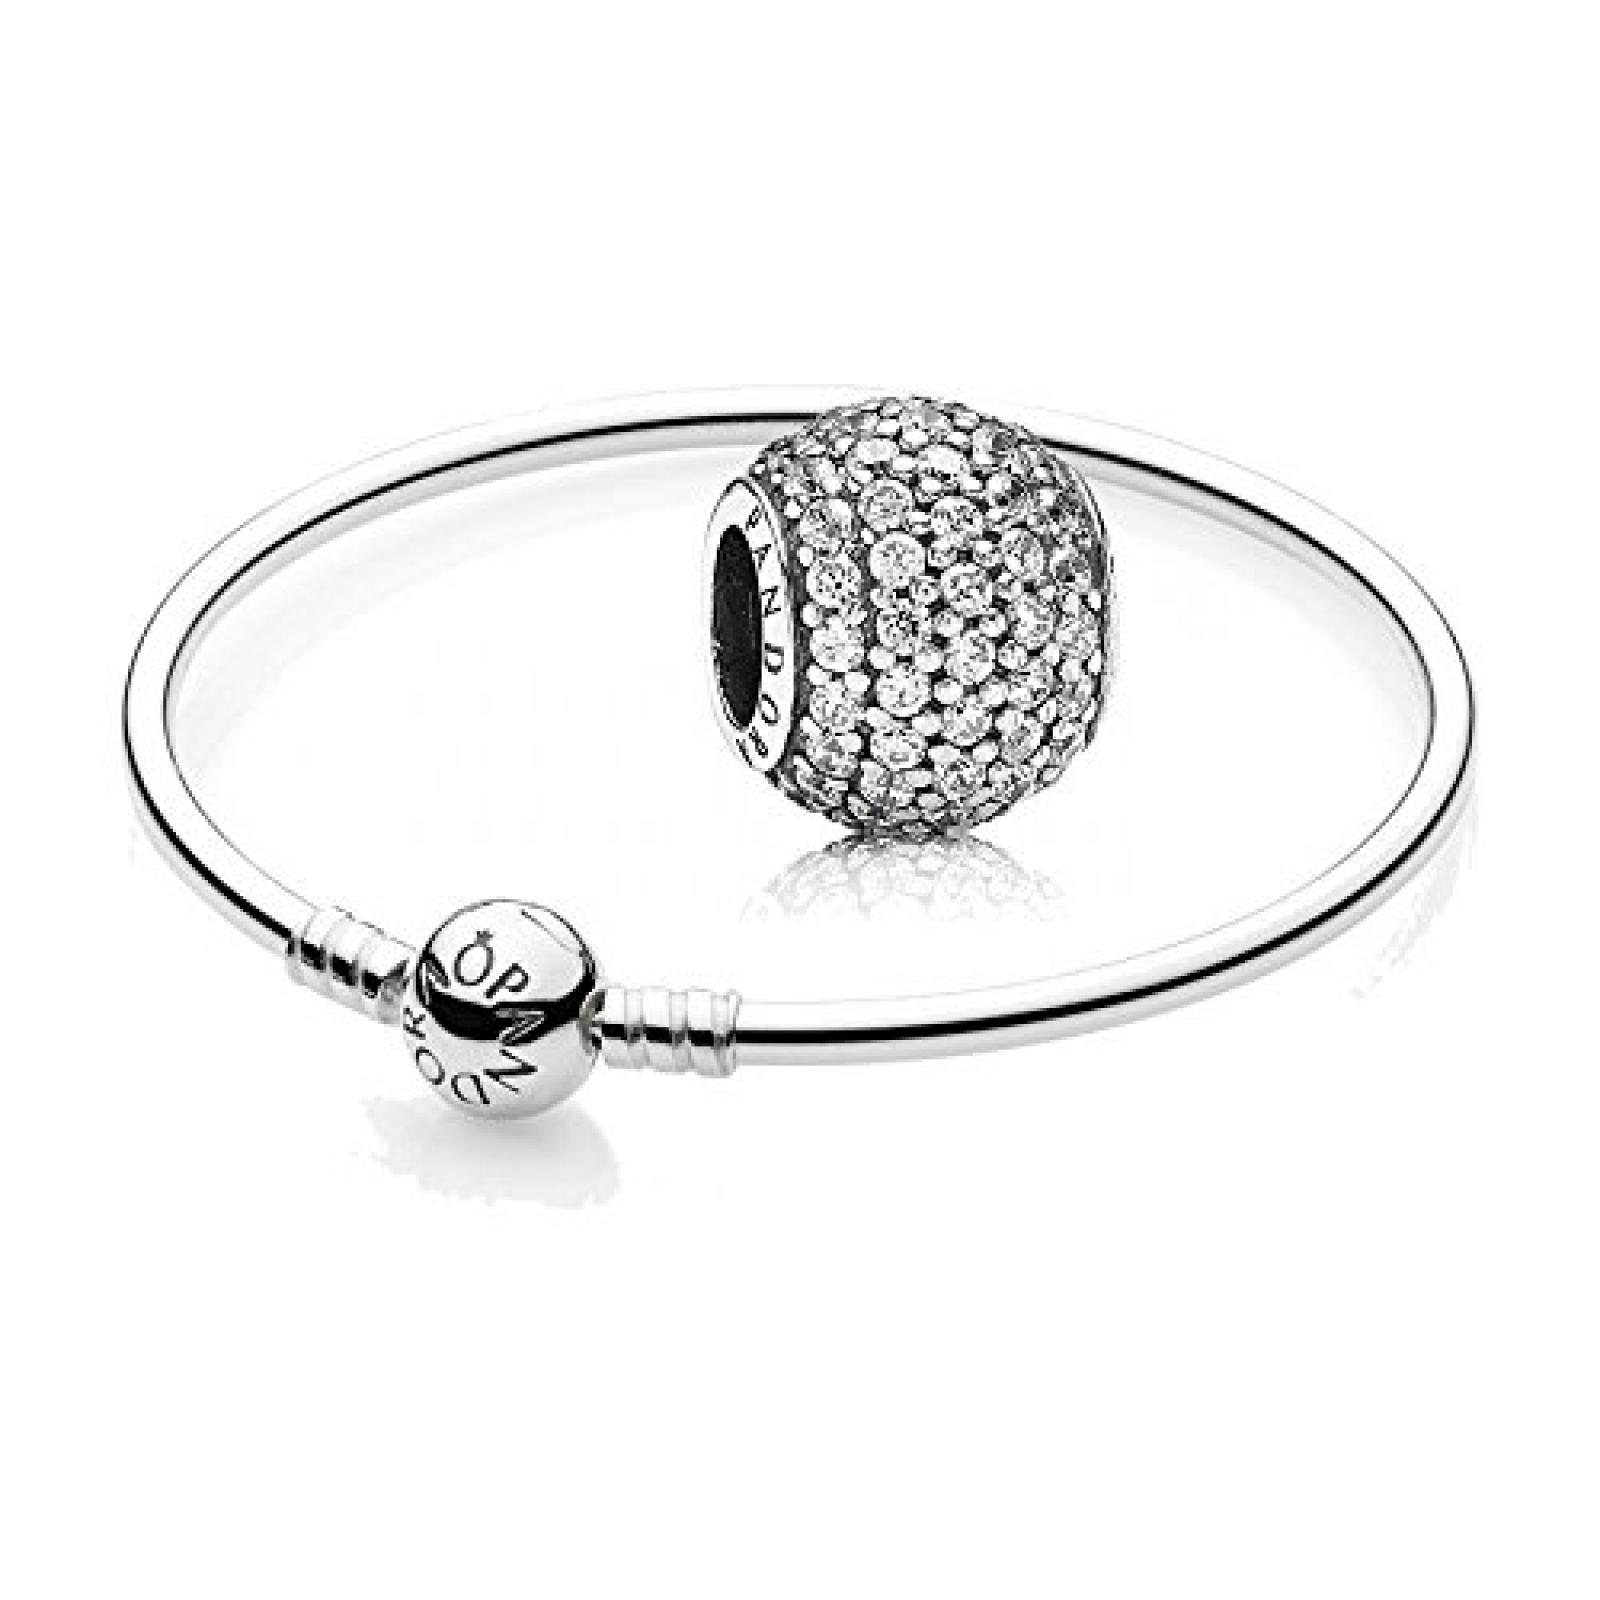 Original Pandora Geschenkset - 1 Silber Armreif 590713 und 1 Silber Element Pavé Kugel mit klarem Zirkonia 791051CZ